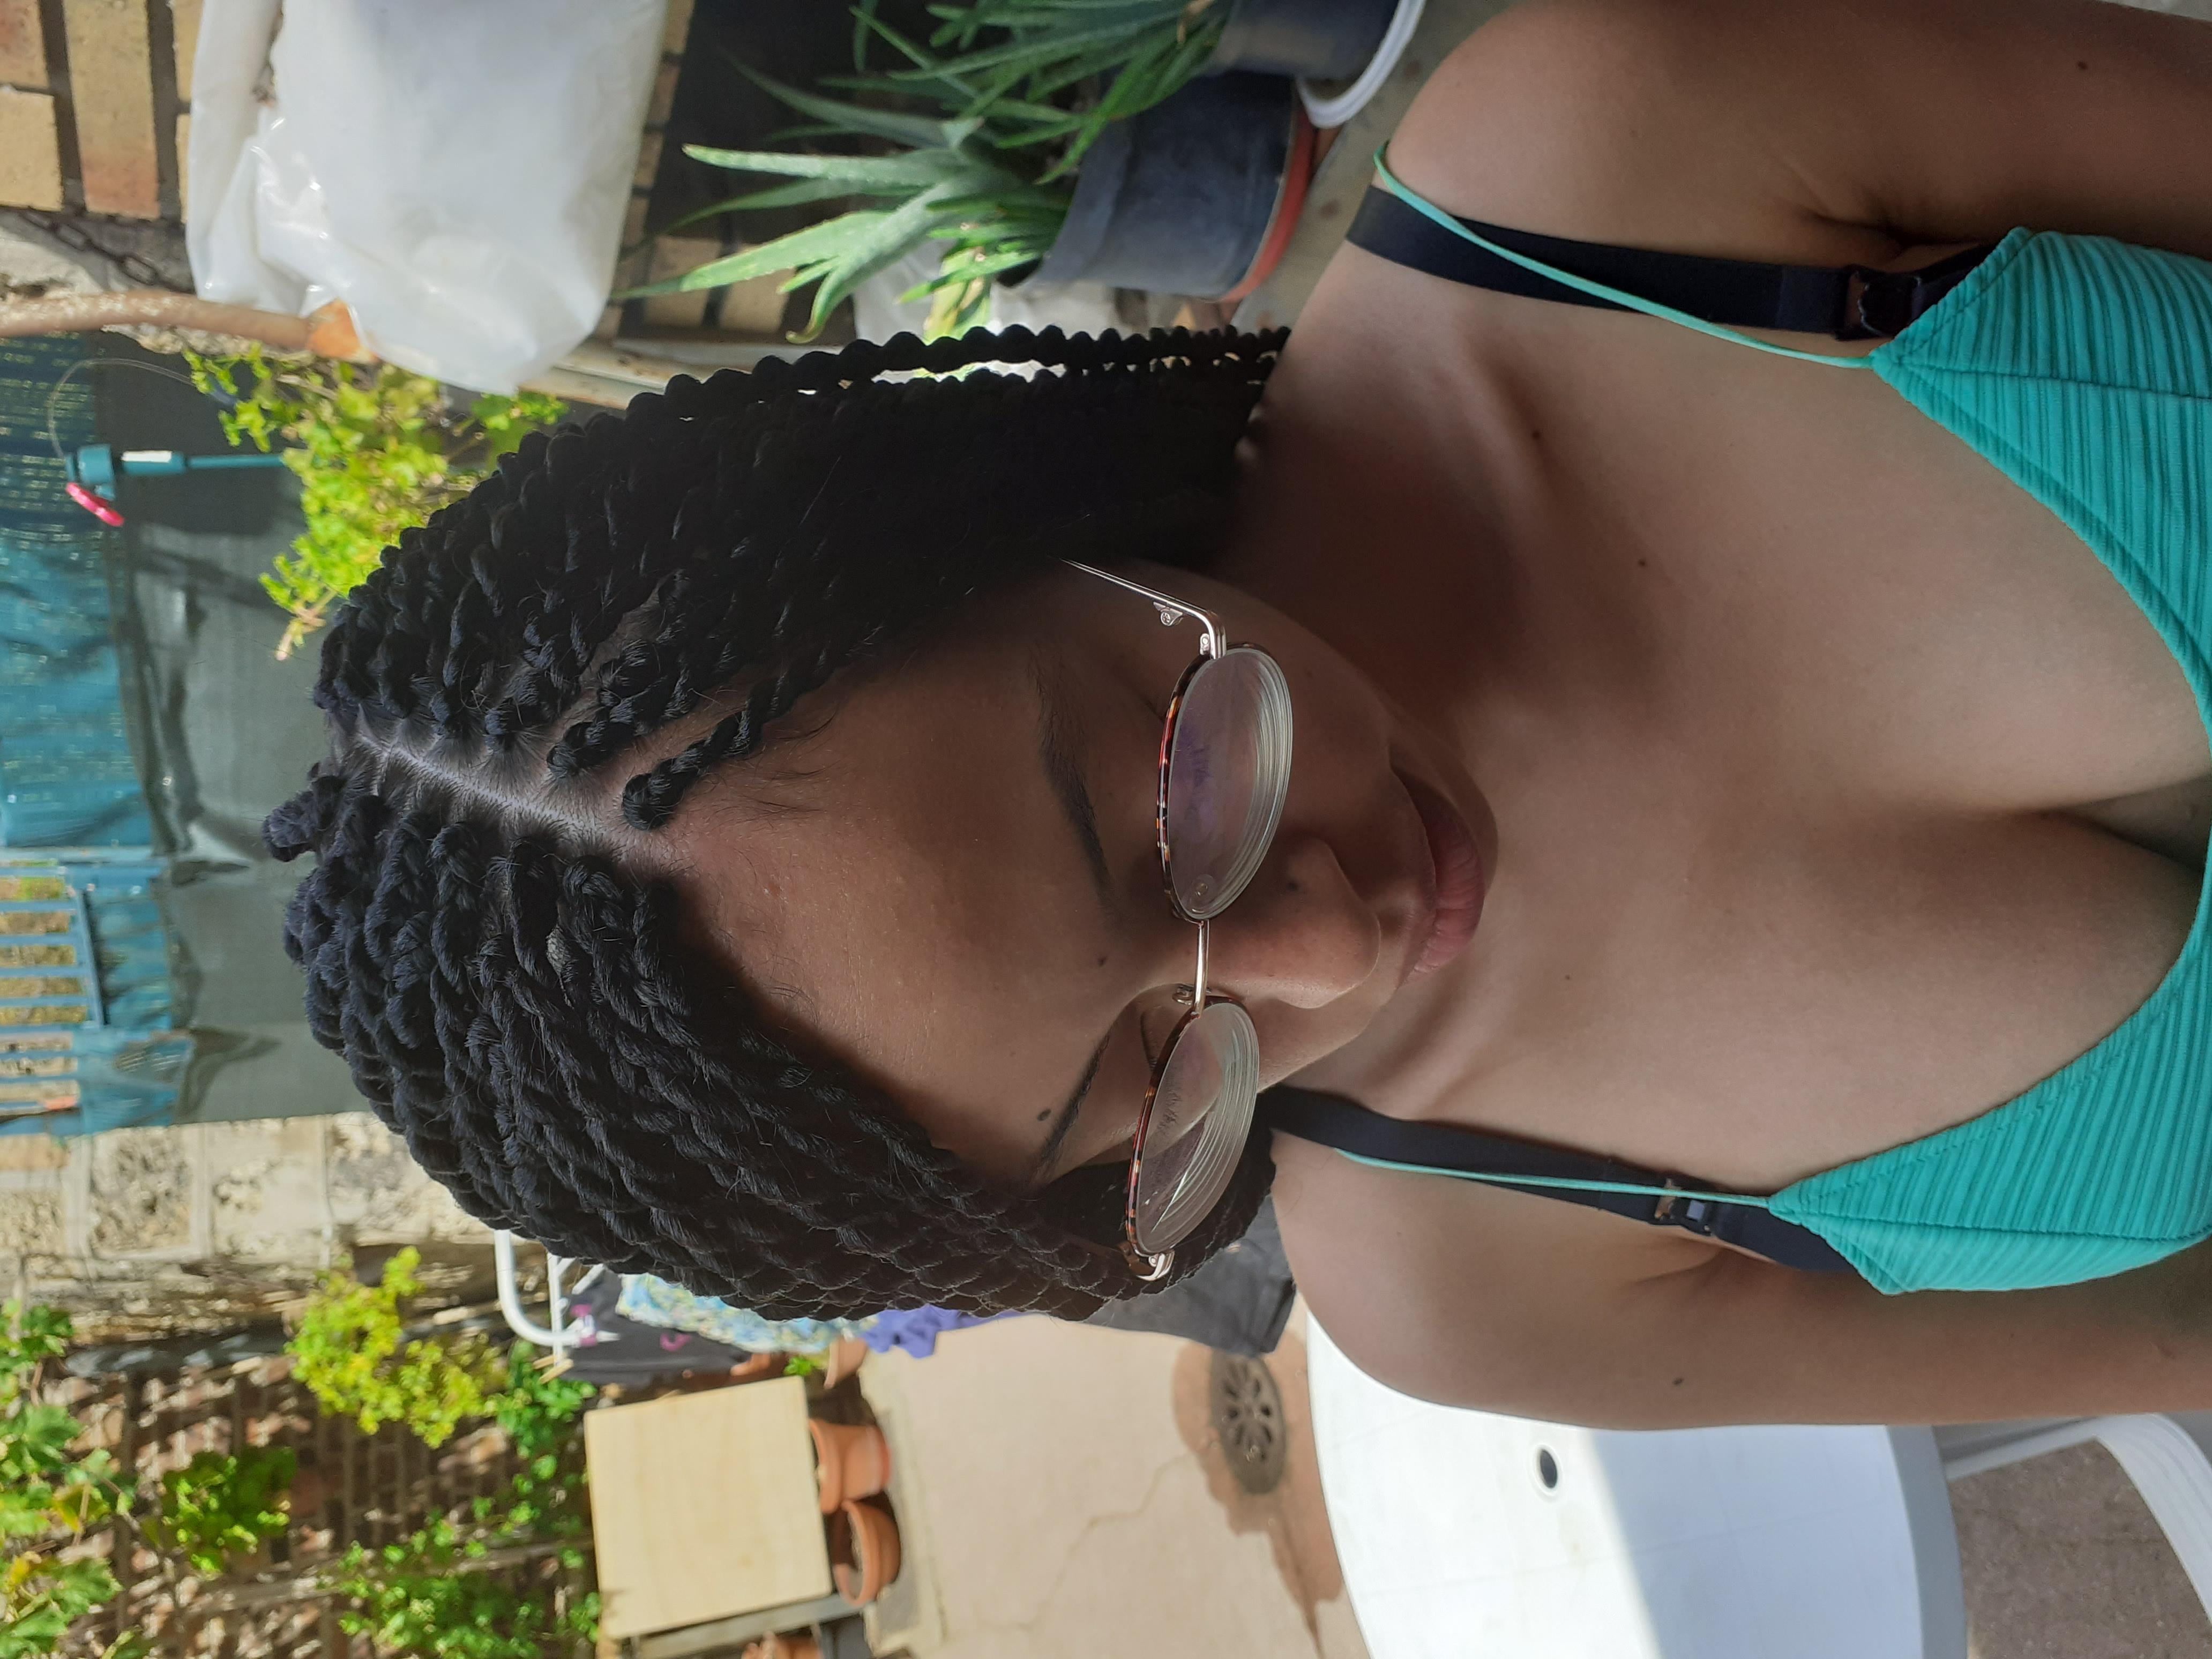 salon de coiffure afro tresse tresses box braids crochet braids vanilles tissages paris 75 77 78 91 92 93 94 95 WHGDCFGI